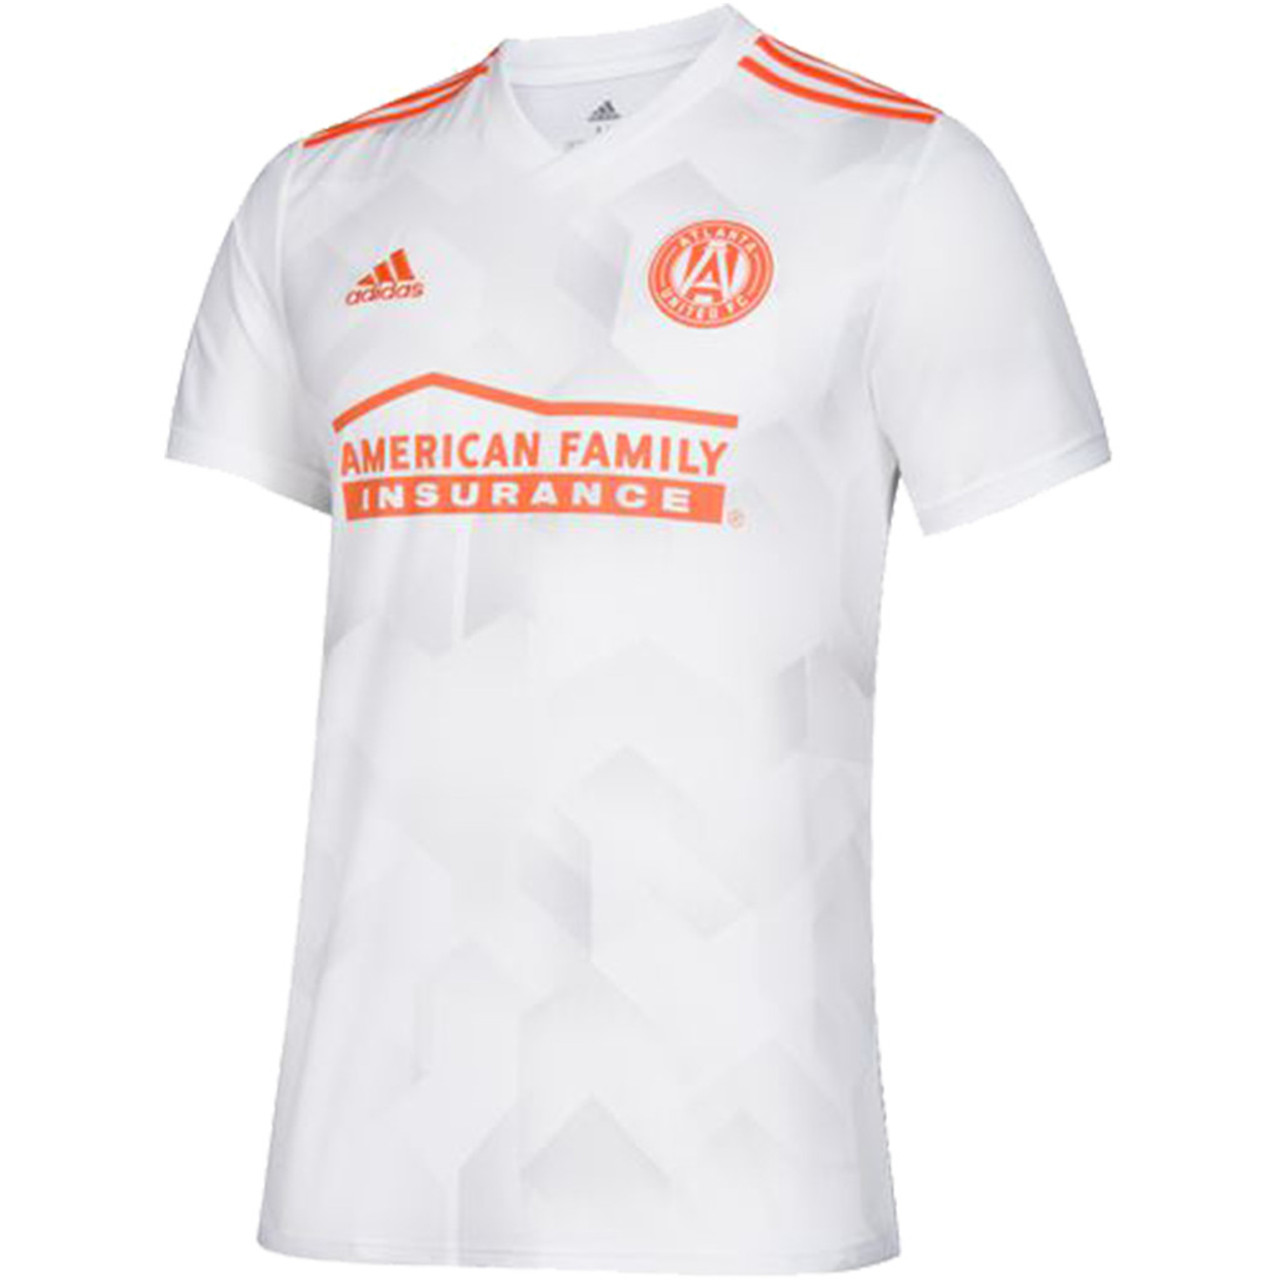 adidas Youth Atlanta United FC Away Replica Jersey - Trenz Shirt Company 4f9b95813